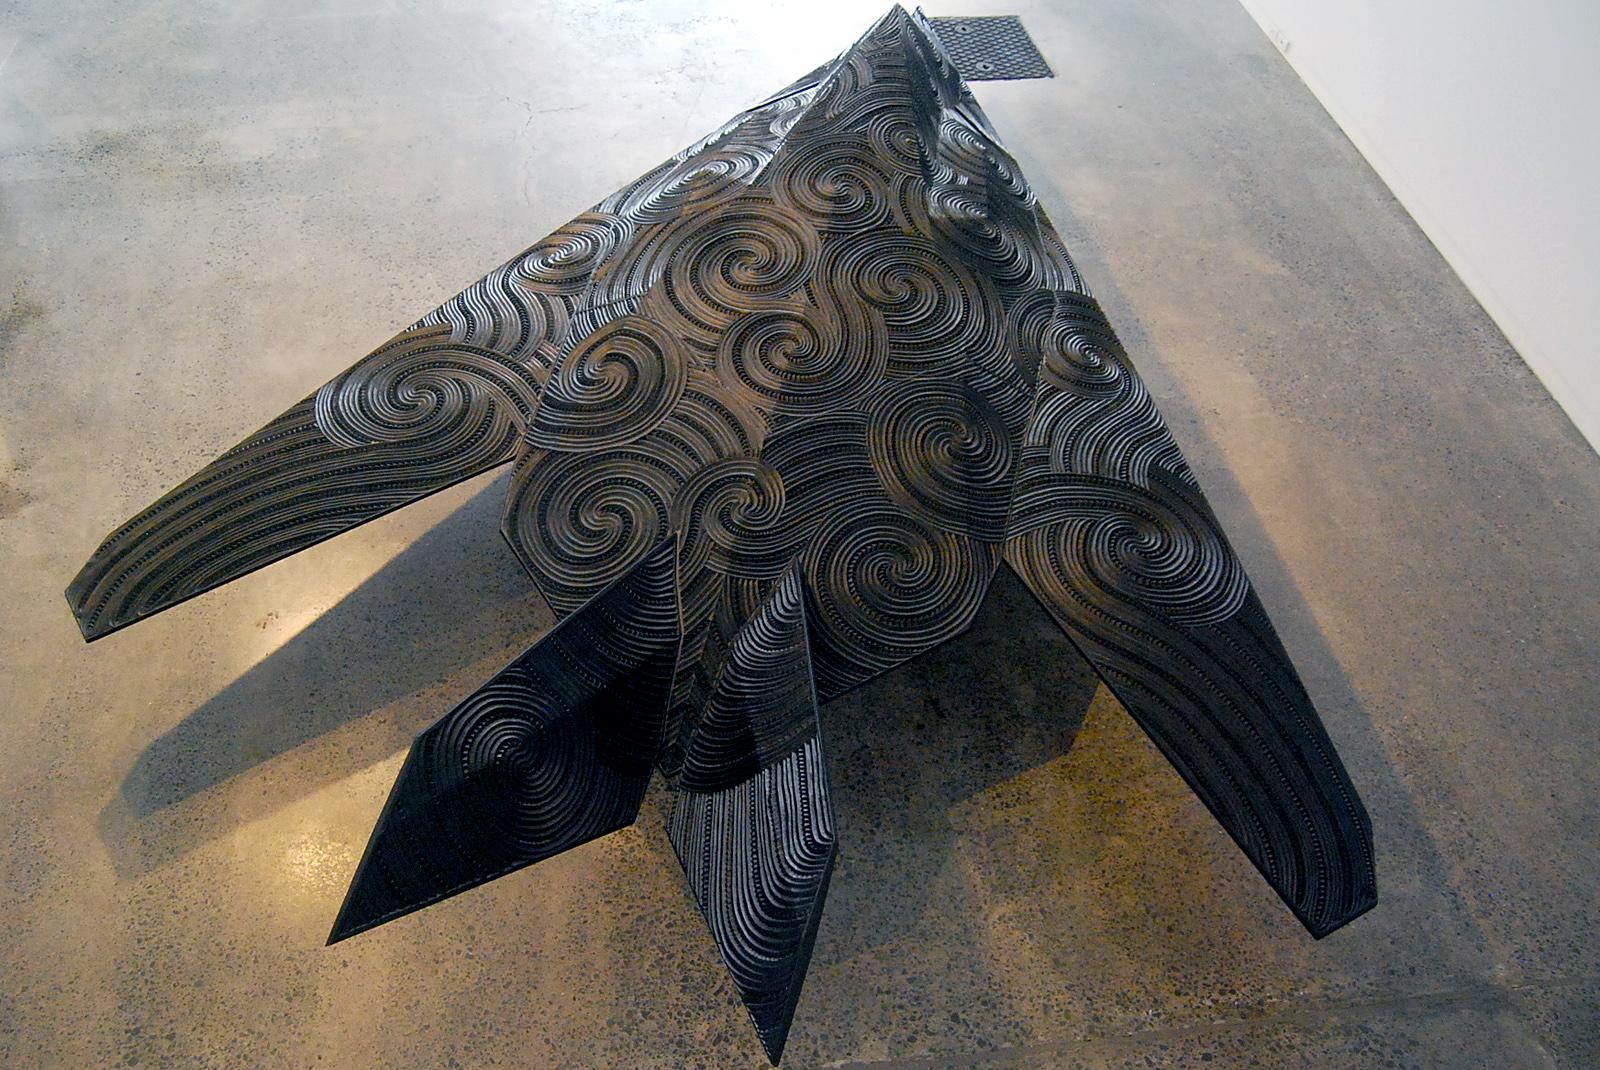 Te Hōkioi (installation view), screenprints/drawings by New Zealand artist Brett Graham